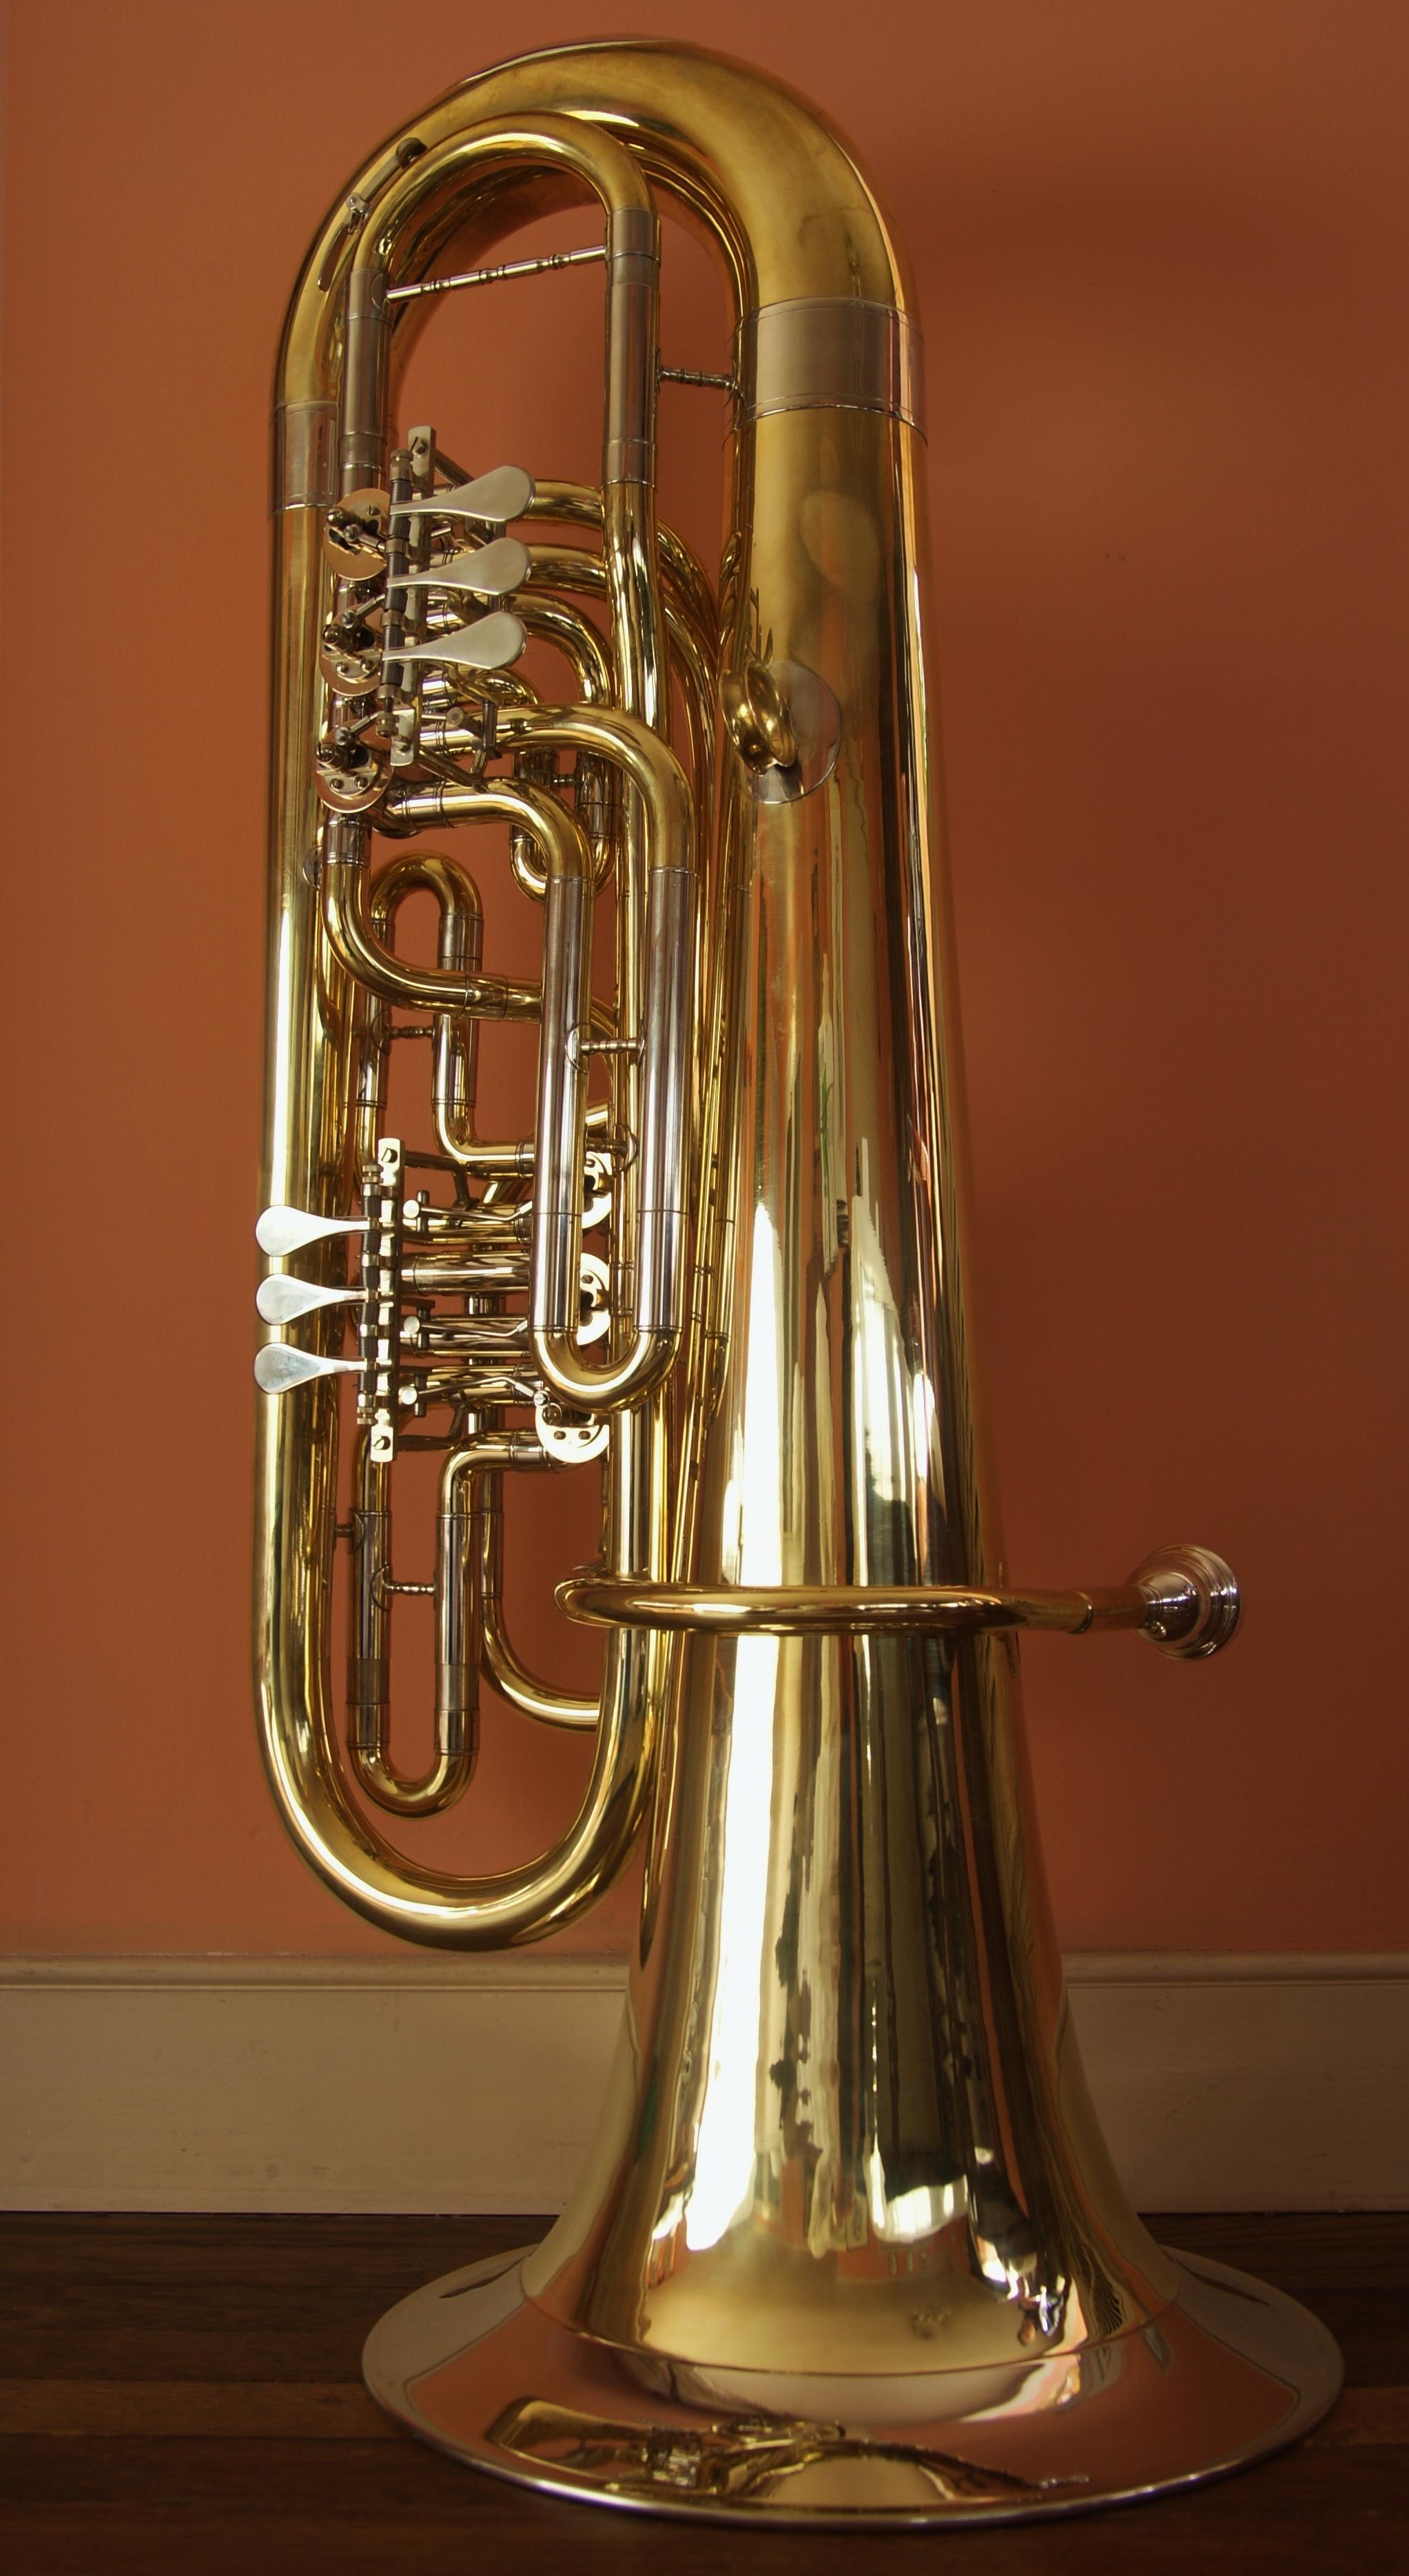 brass instruments musicians friend